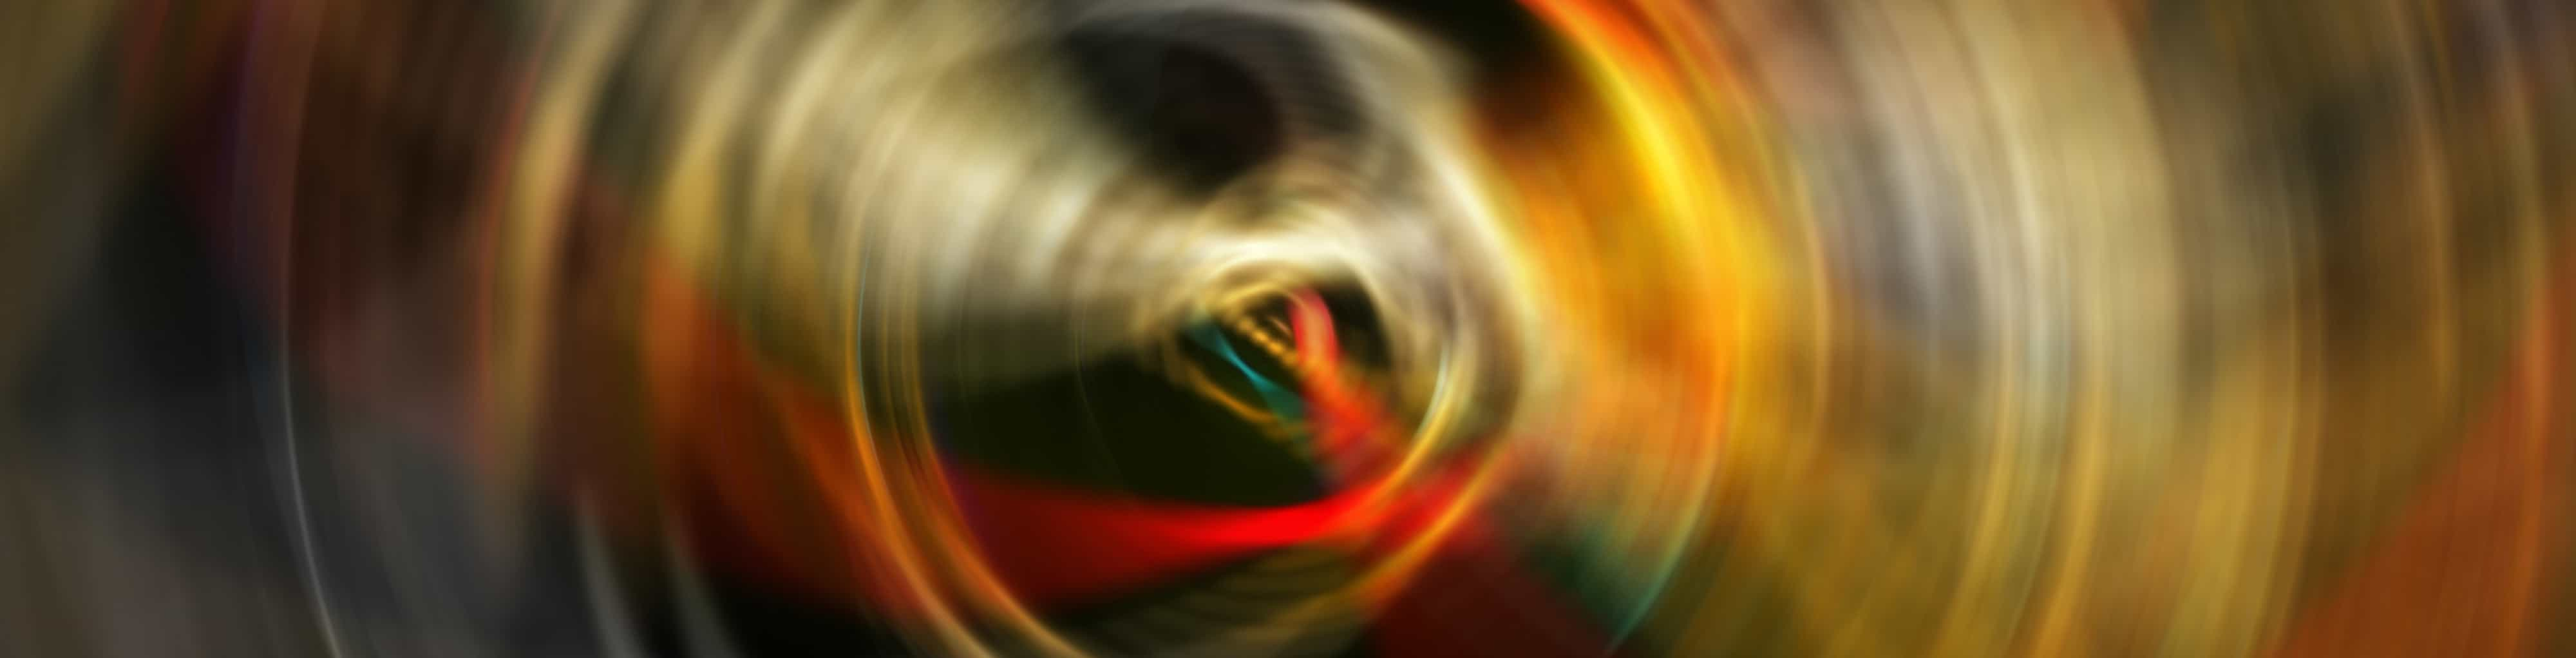 motion-effect